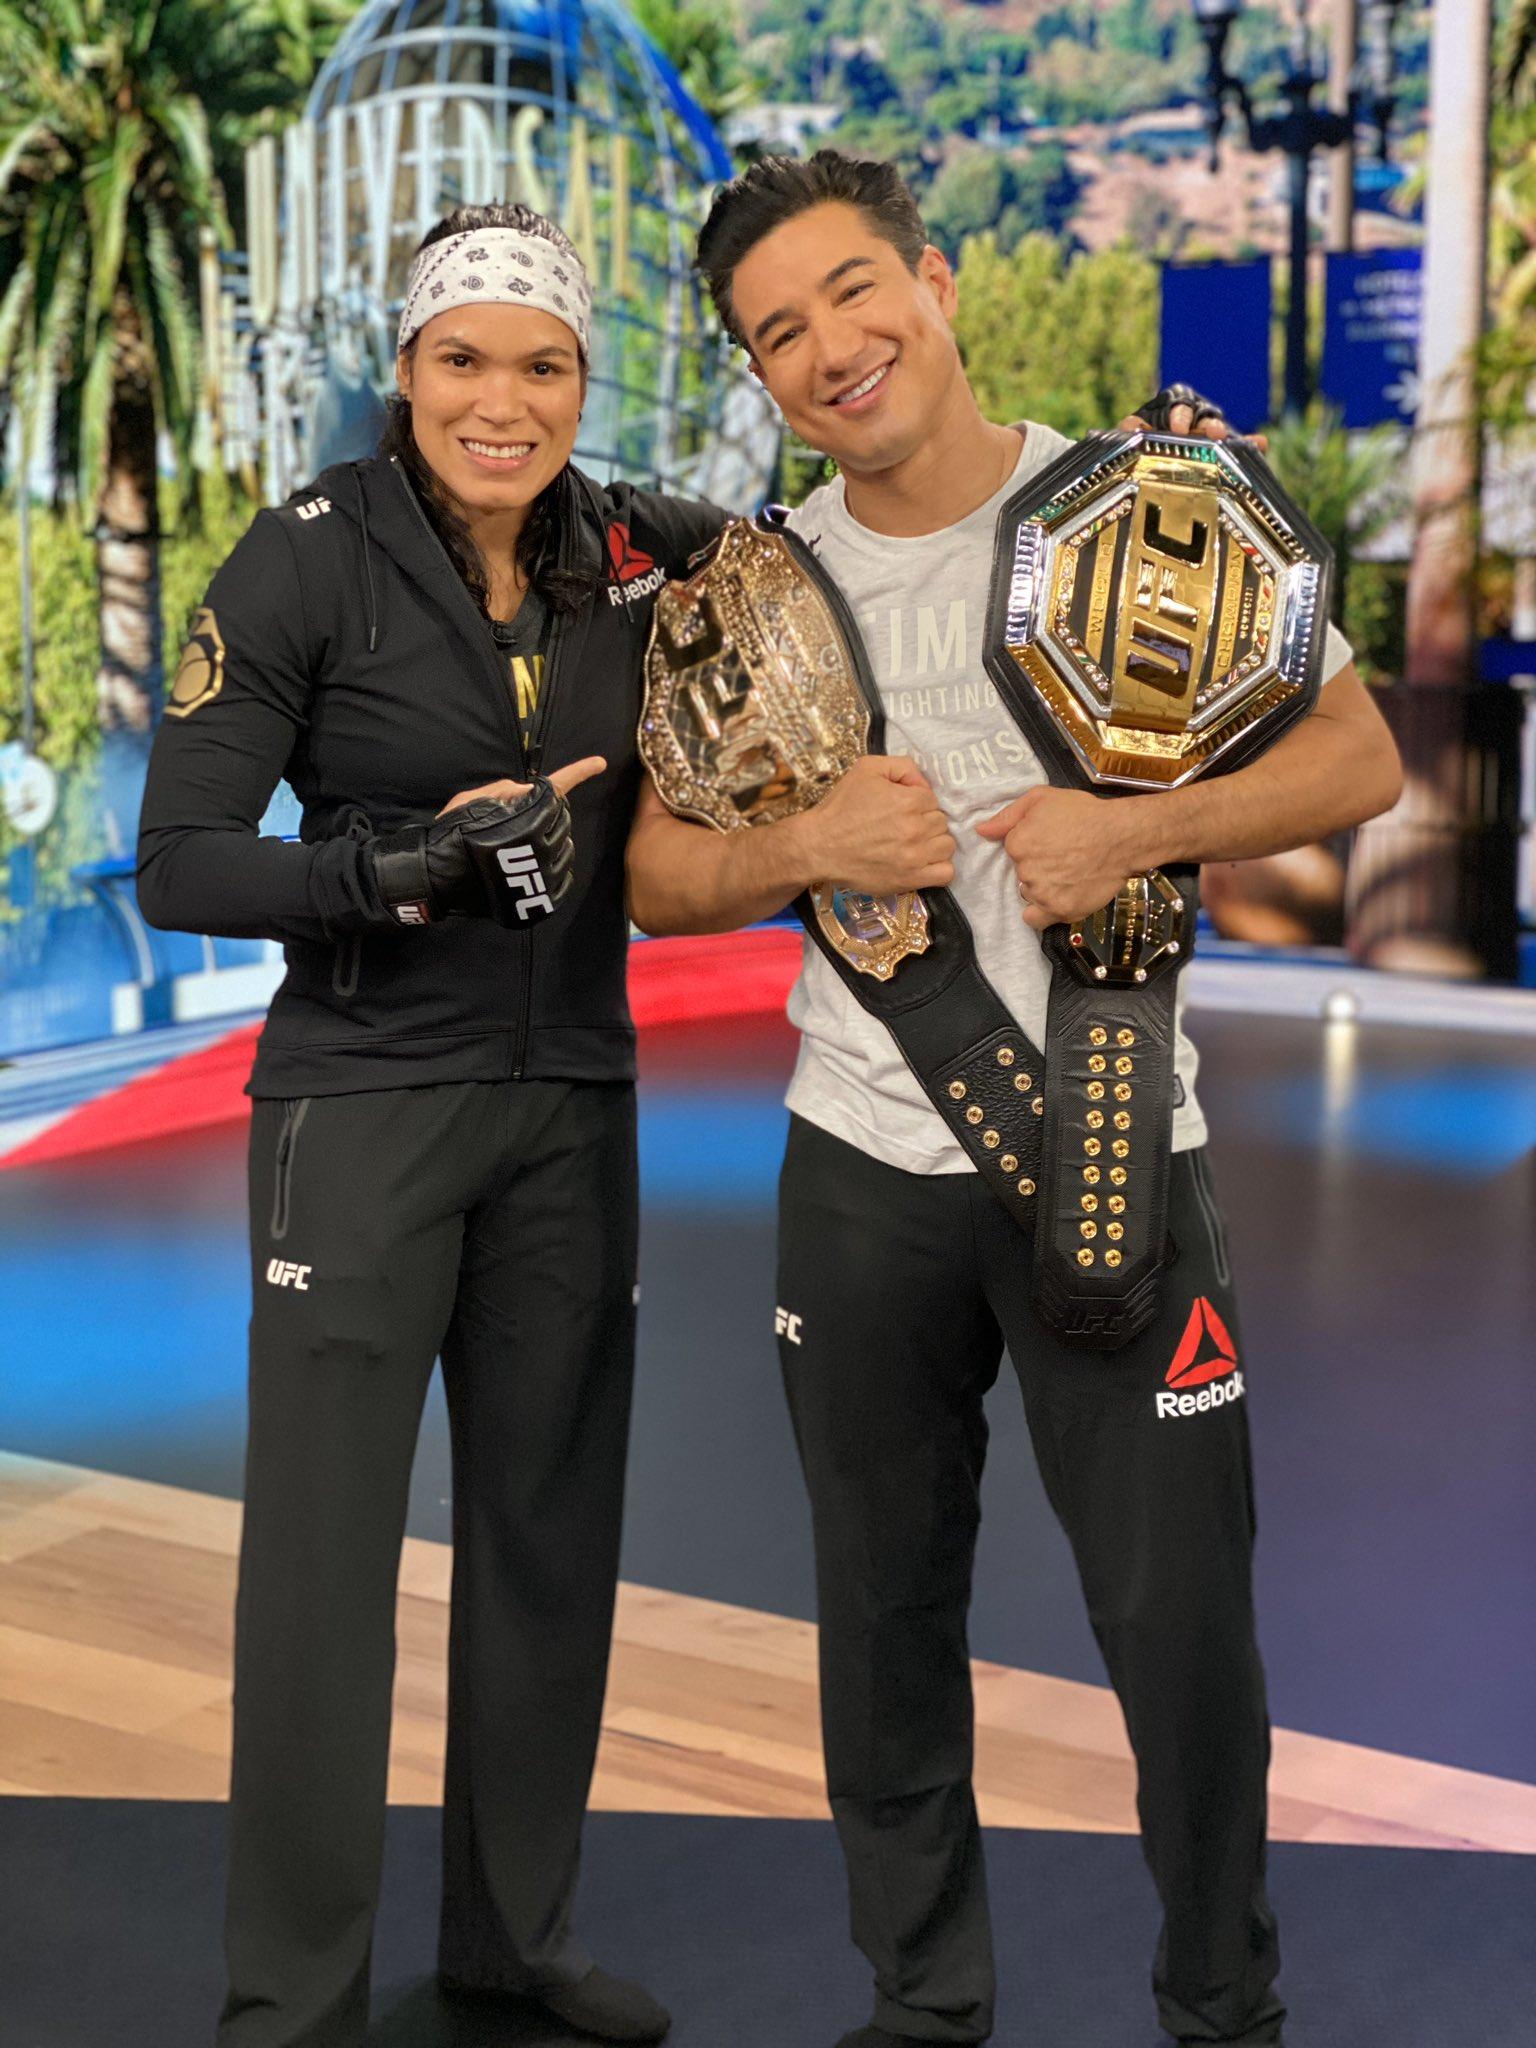 Baddest woman on the planet. And a total sweetheart... @UFC   #AmandaNunes  #WorldChampion  #UFC  #ChokeMeOut https://t.co/3EywXiThaK